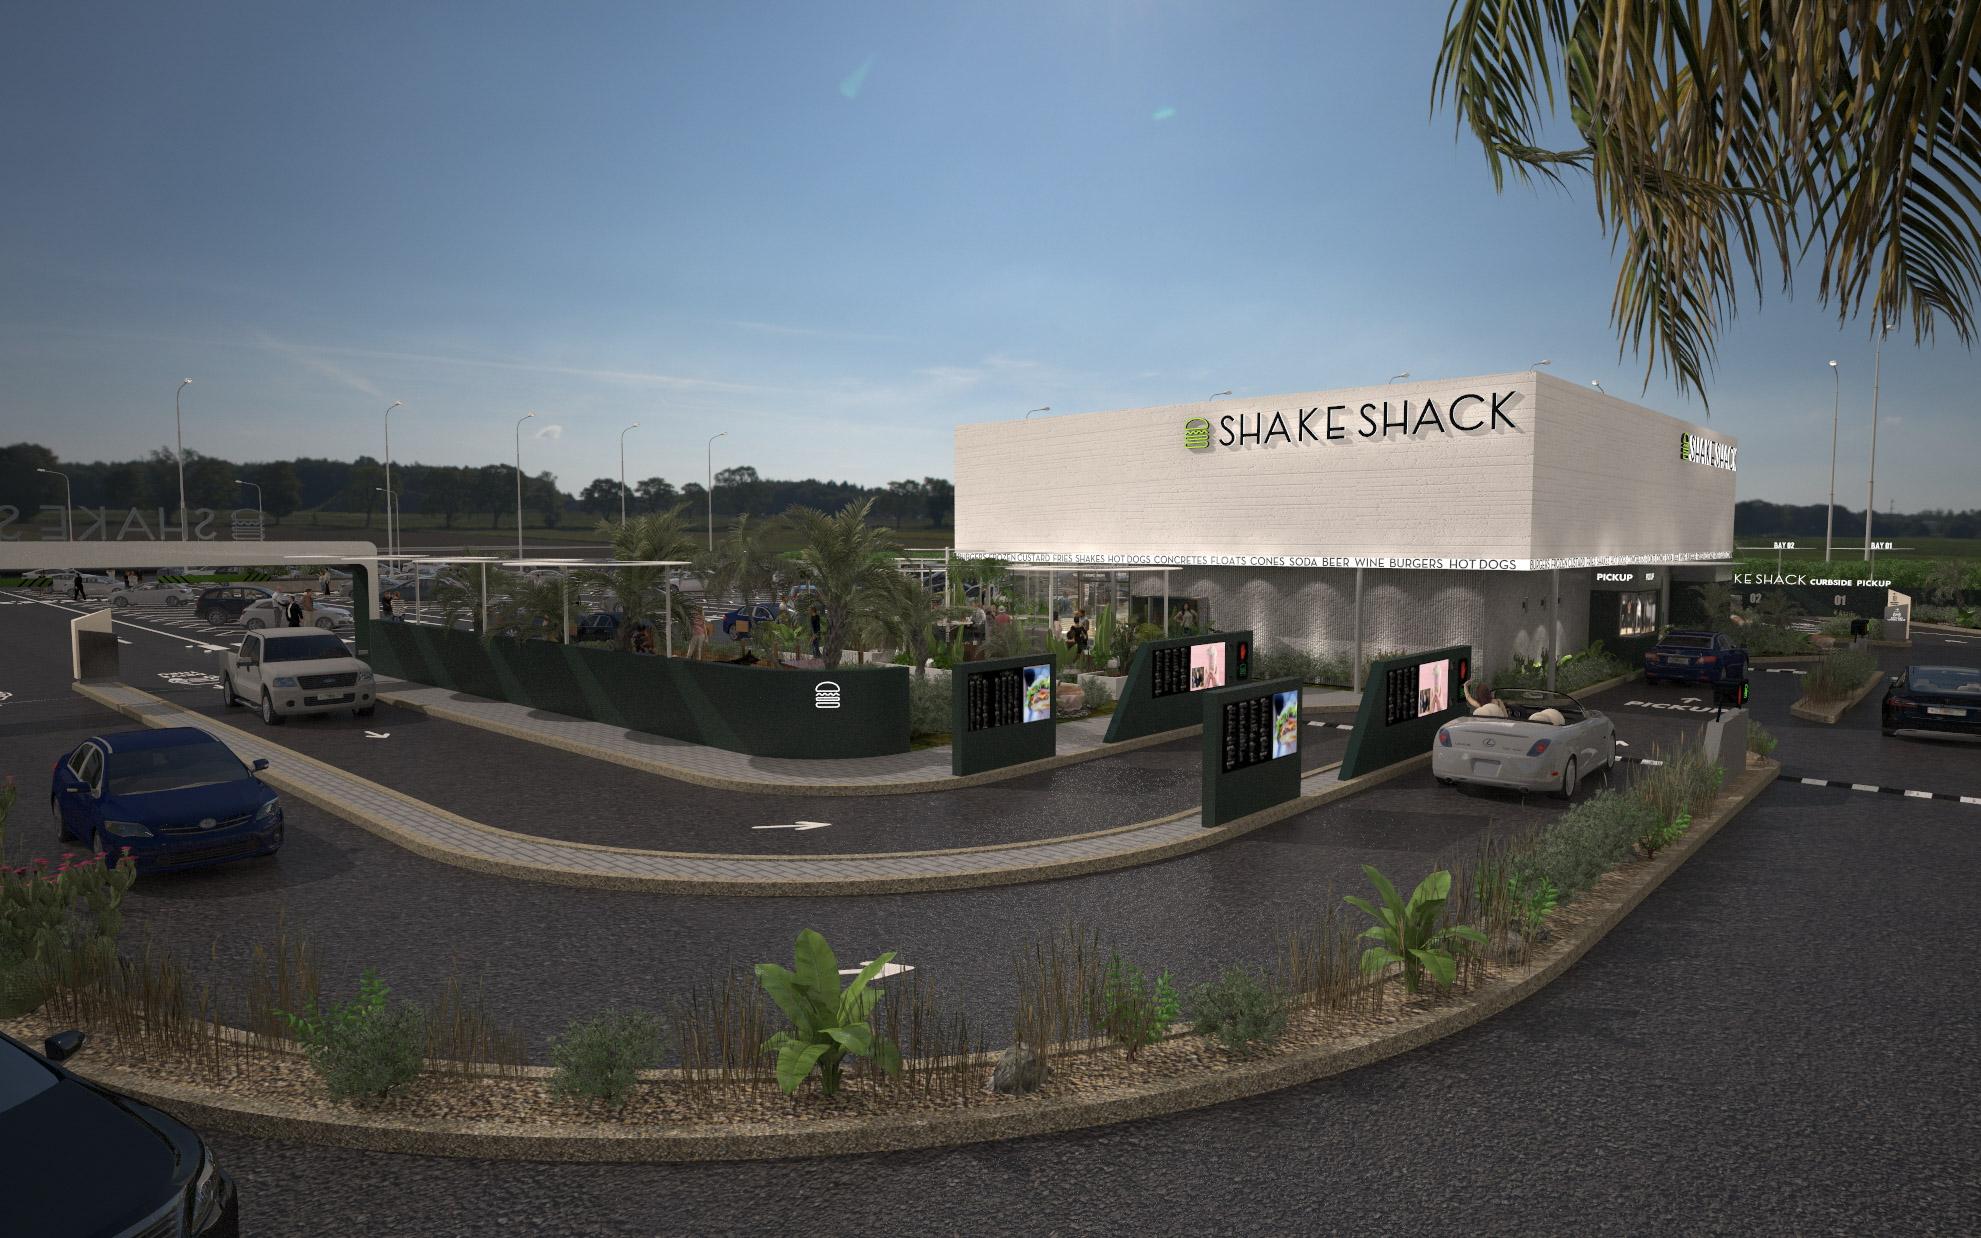 shake shack drive-thru